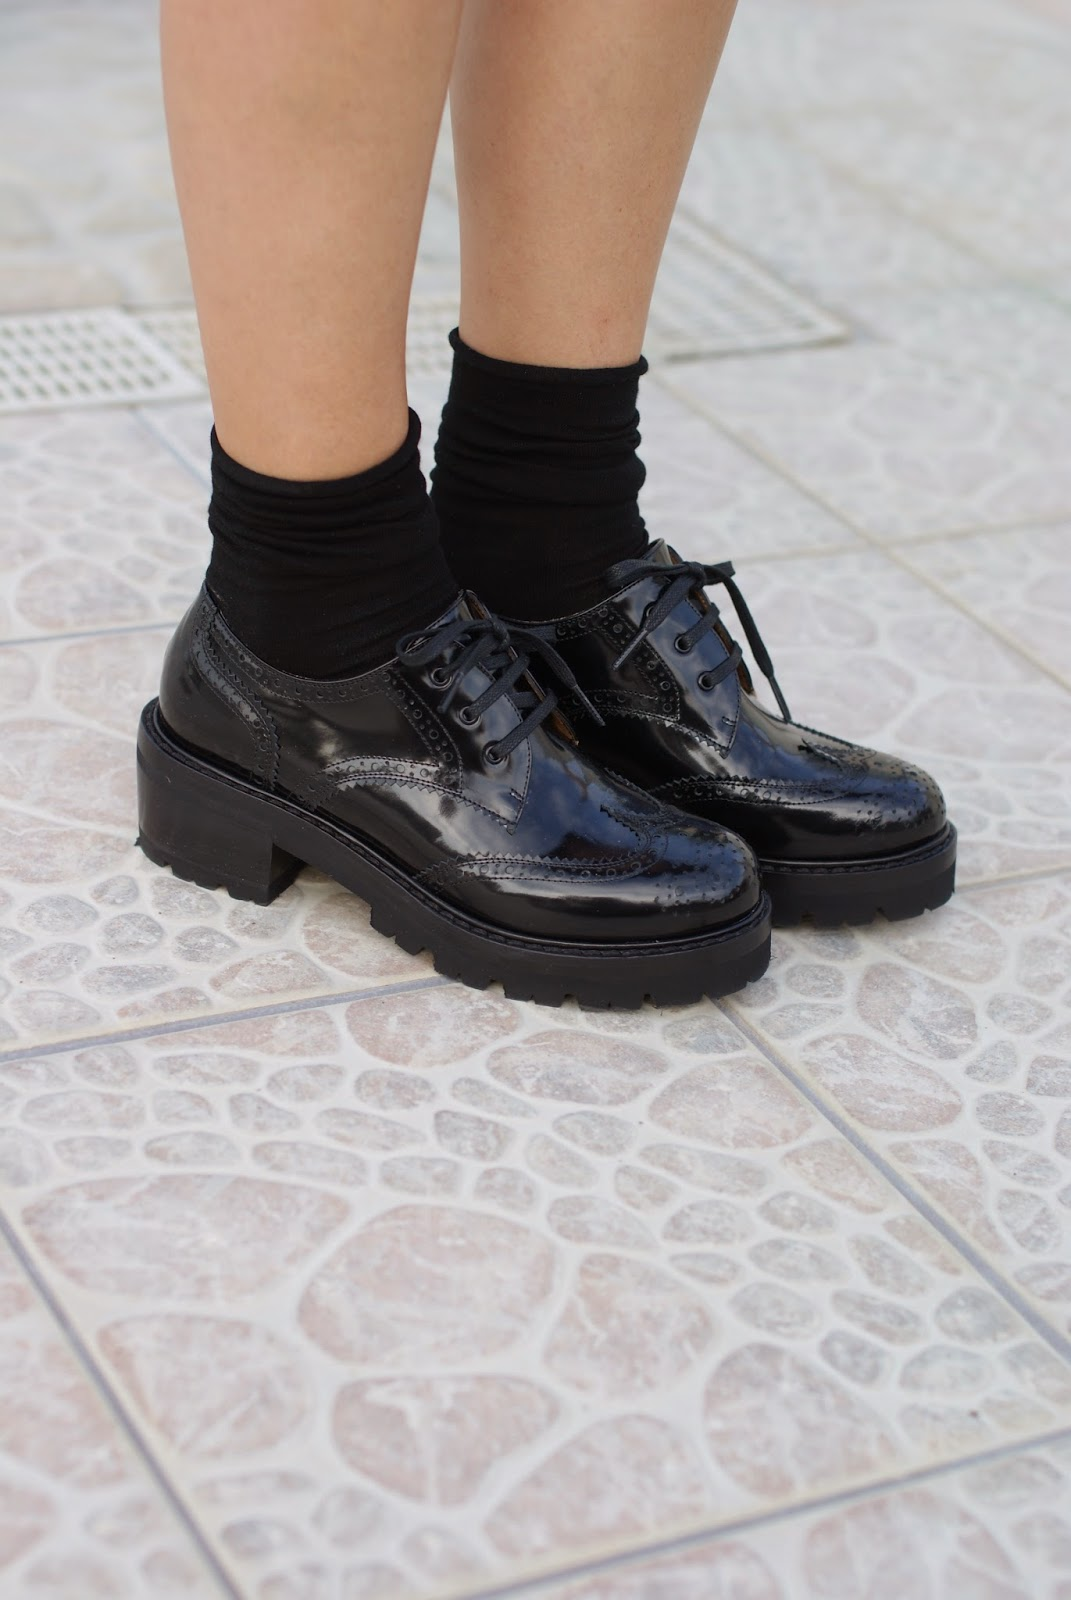 Nando Muzi brogues, patent leather brogues, Fashion and Cookies, fashion blogger